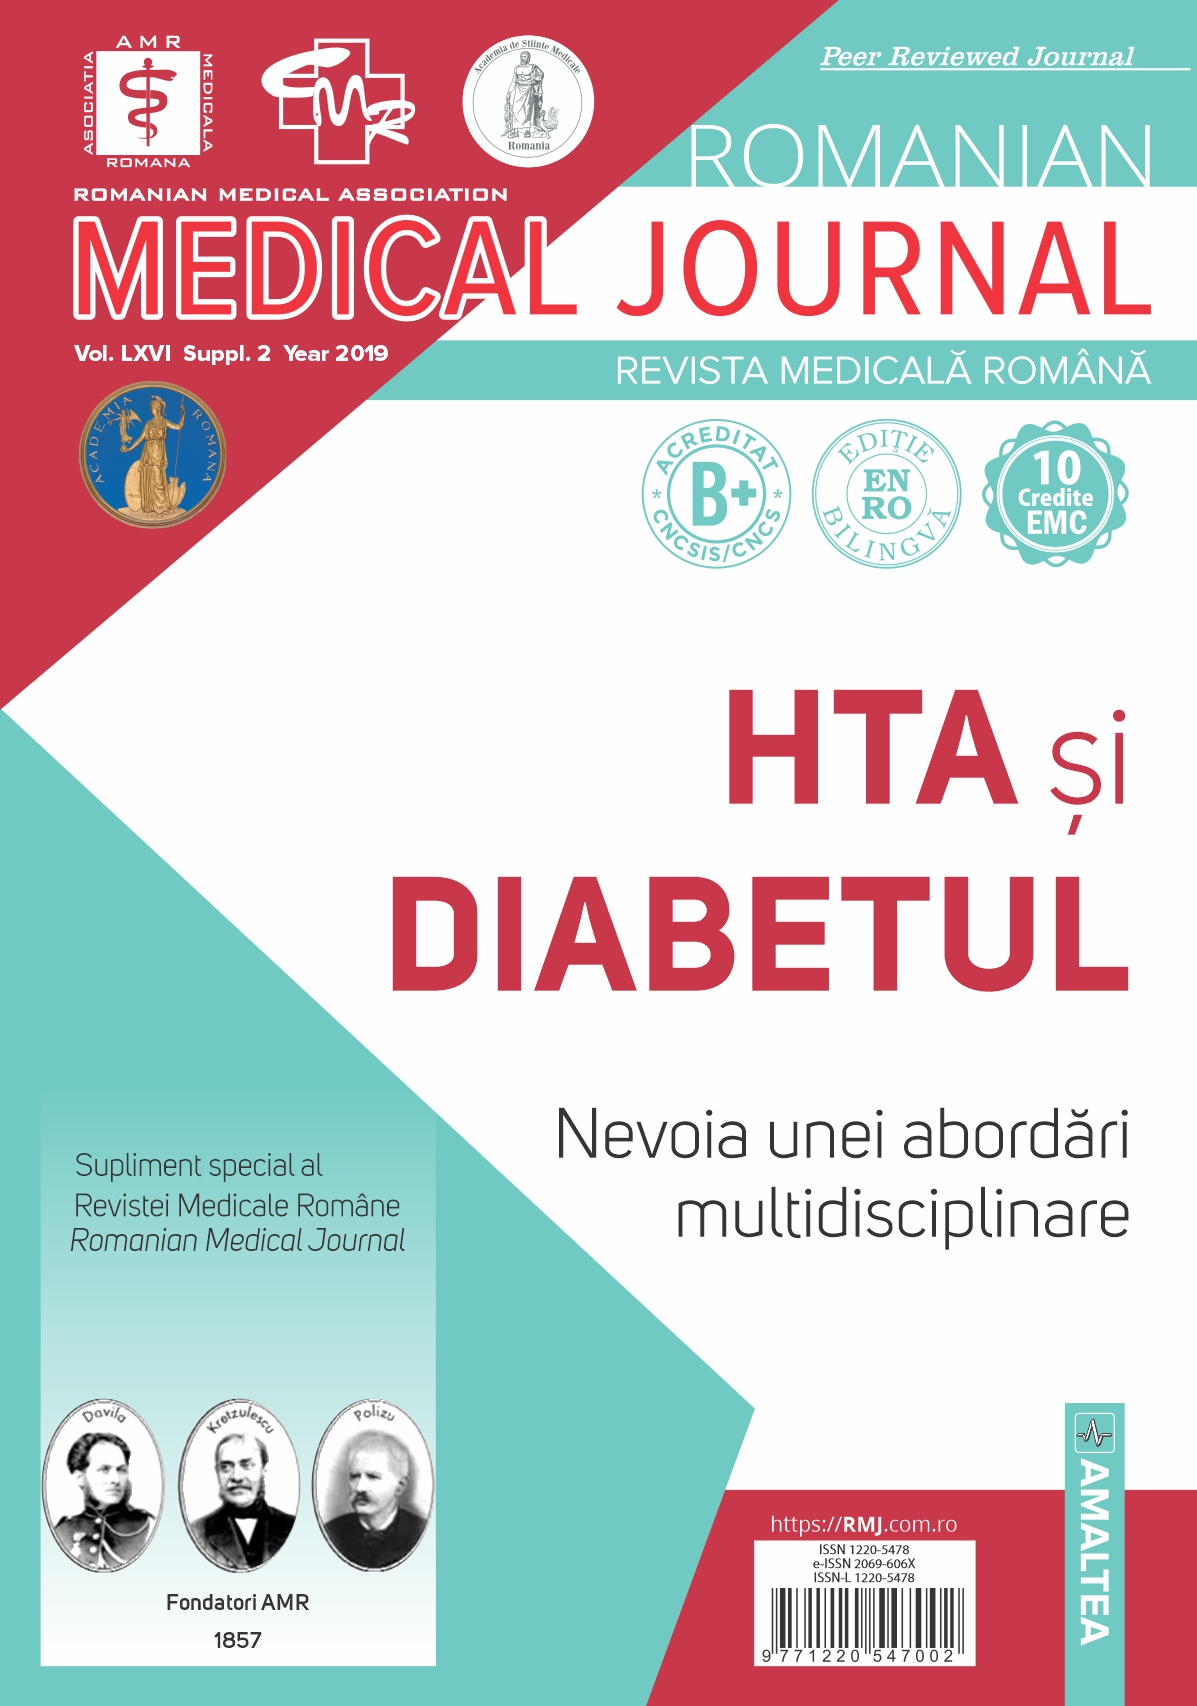 Romanian Medical Journal - REVISTA MEDICALA ROMANA, Vol. LXVI, Suppl. 2, Year 2019